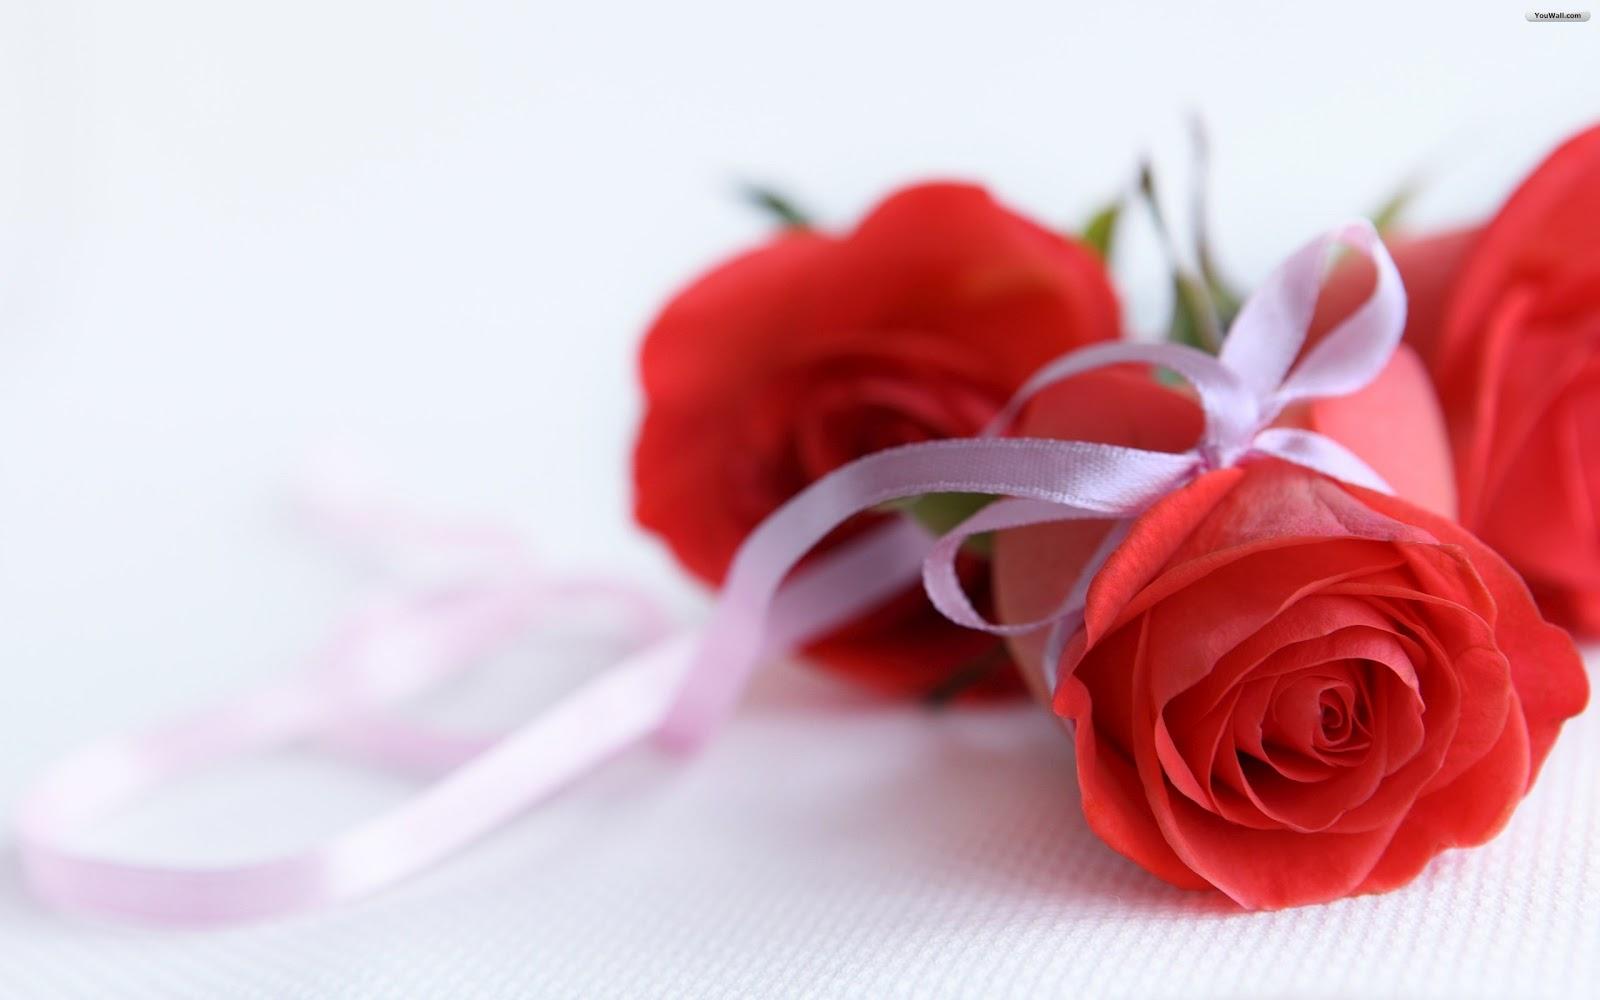 http://1.bp.blogspot.com/-M0QxSHj3NmM/T9V1nmDNDJI/AAAAAAAAFfI/H1X-6n7IC-I/s1600/Rose-Wallpaper-63.jpg